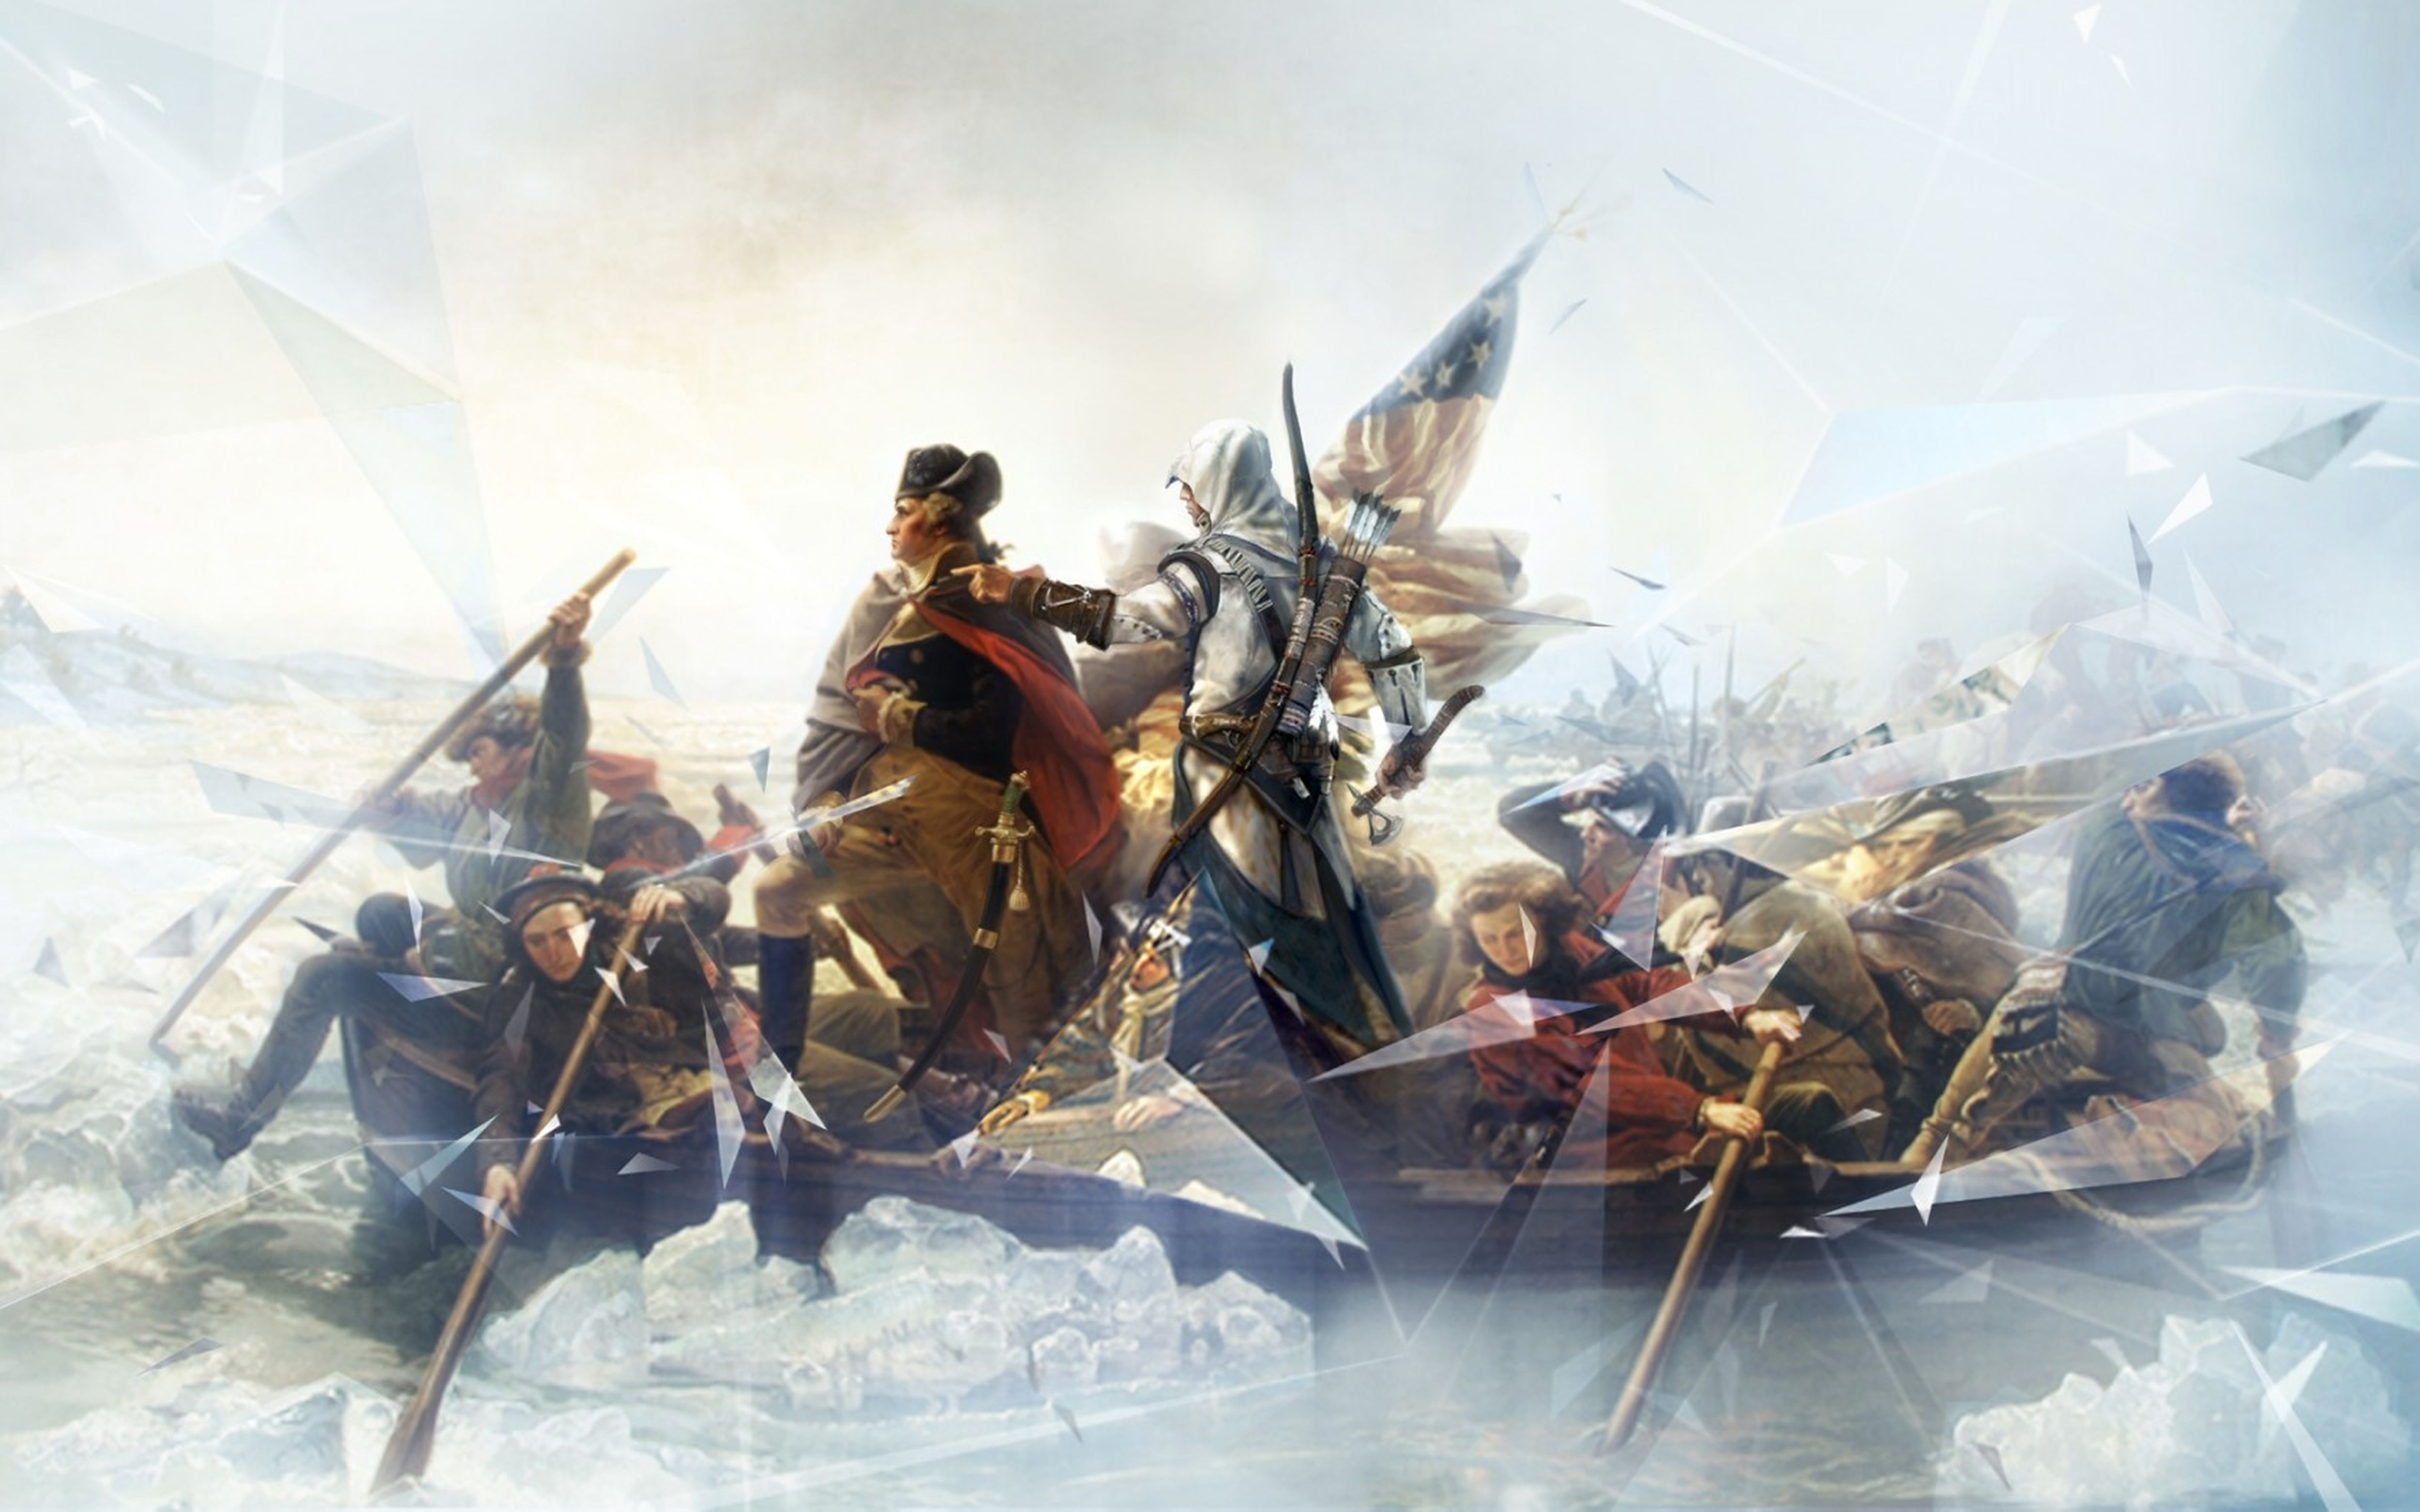 Assassins Creed III Wallpaper 5000x3125